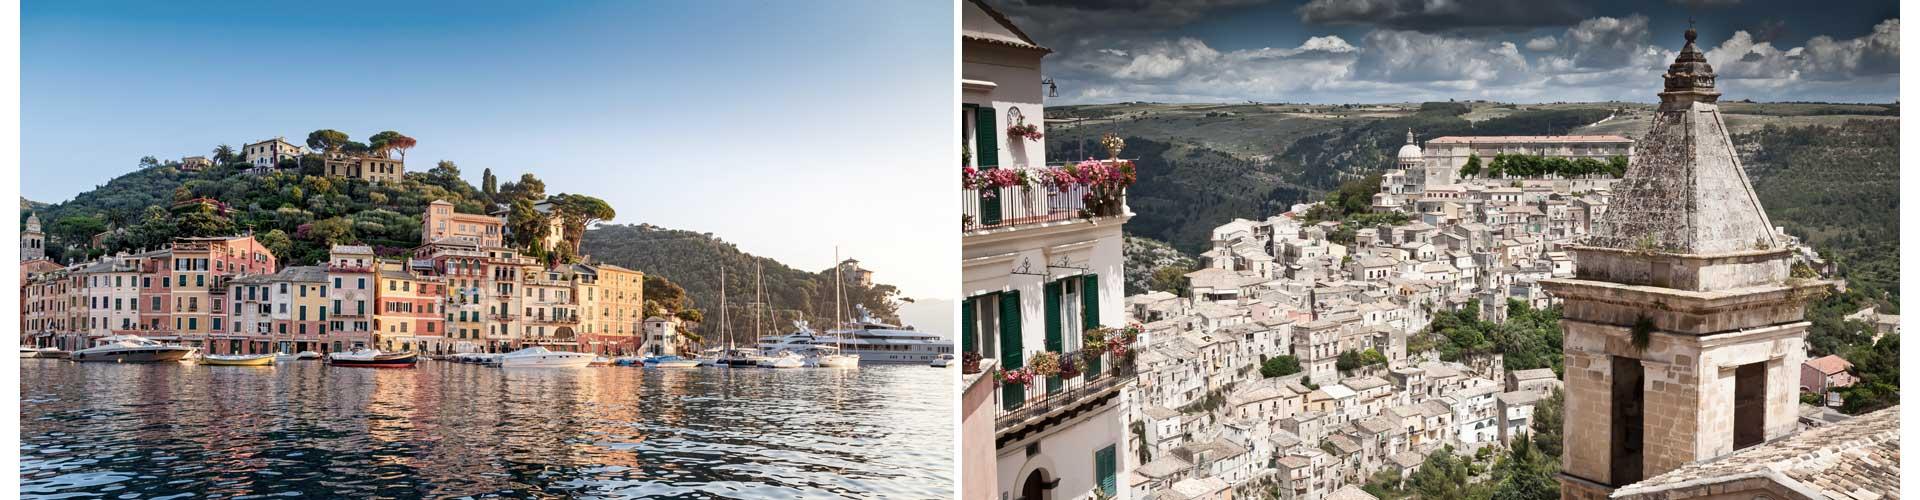 Italien Reisetagebuch europa portofino küste